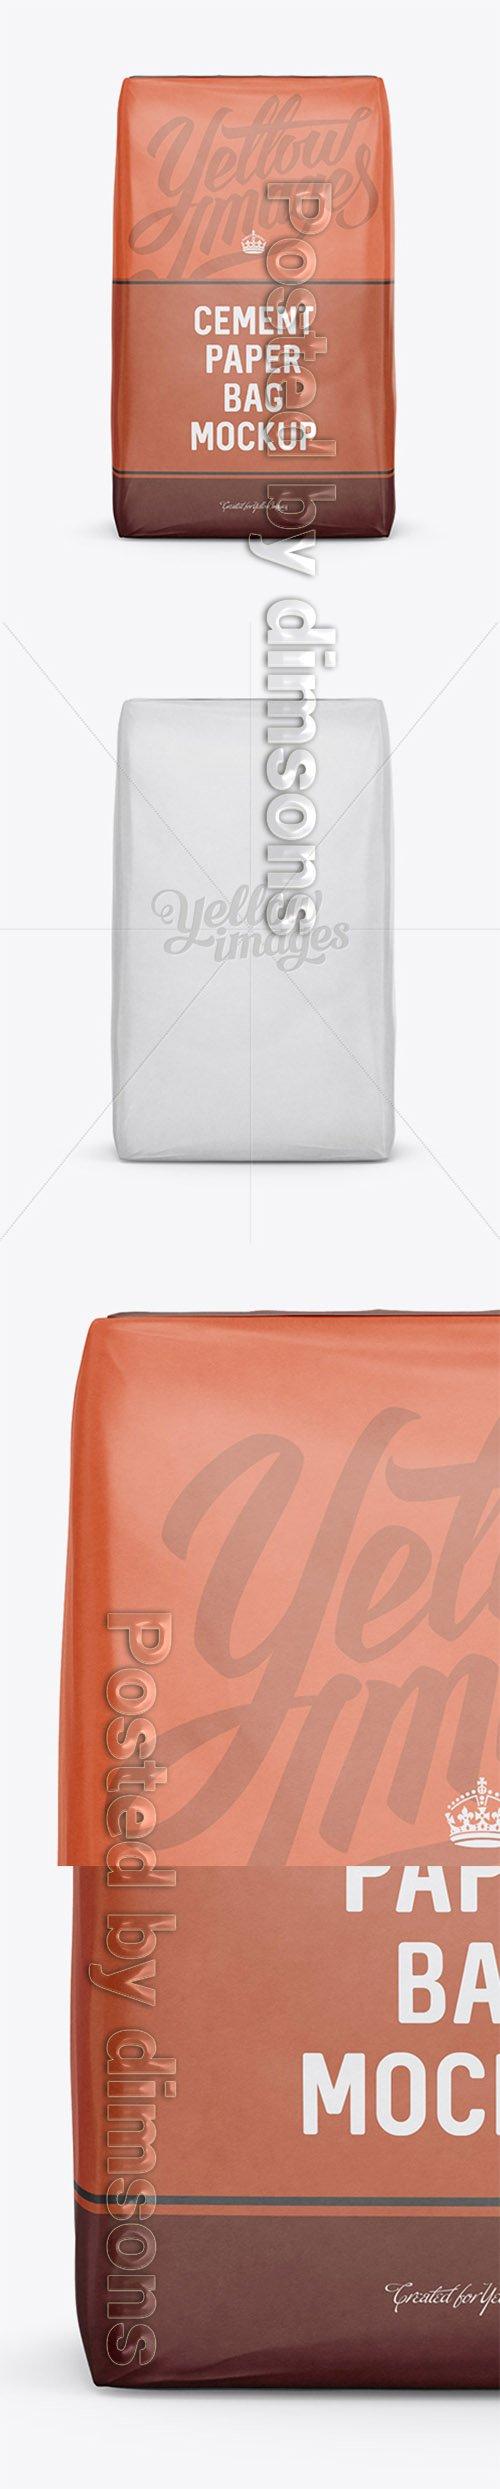 Cement Paper Bag Mockup - Front View 13389 TIF